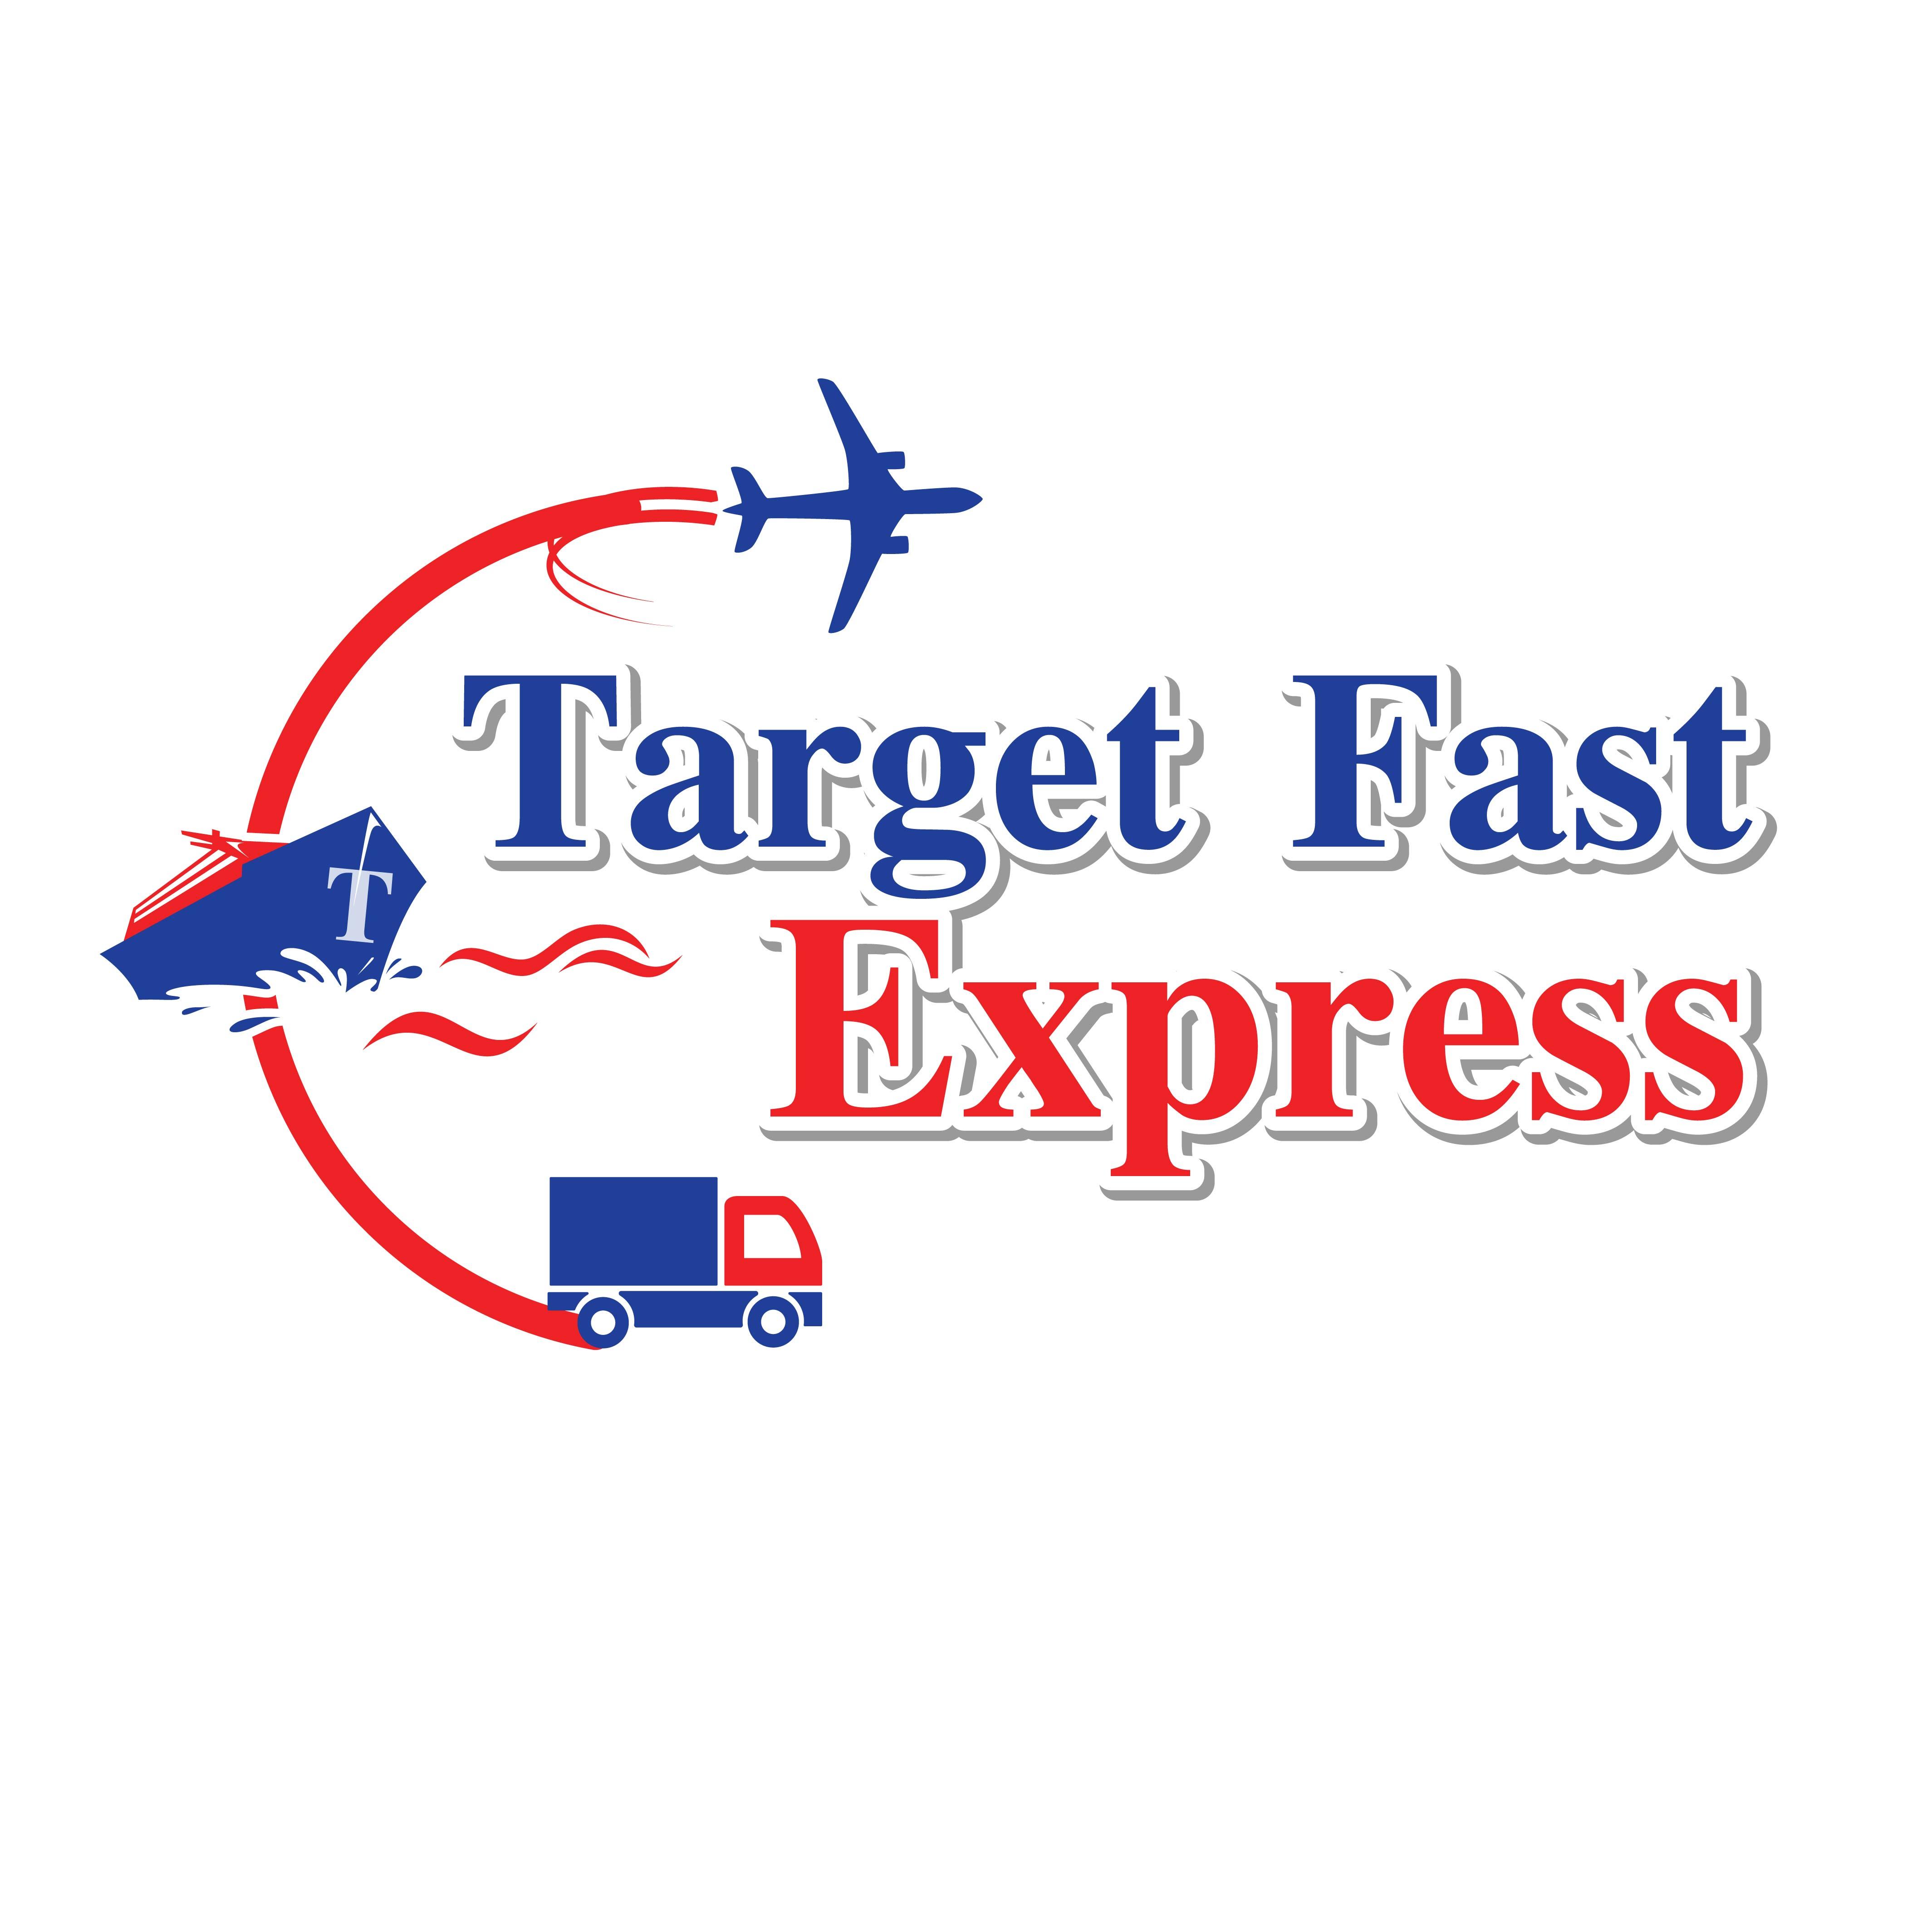 http://www.targetfastexpress.com/